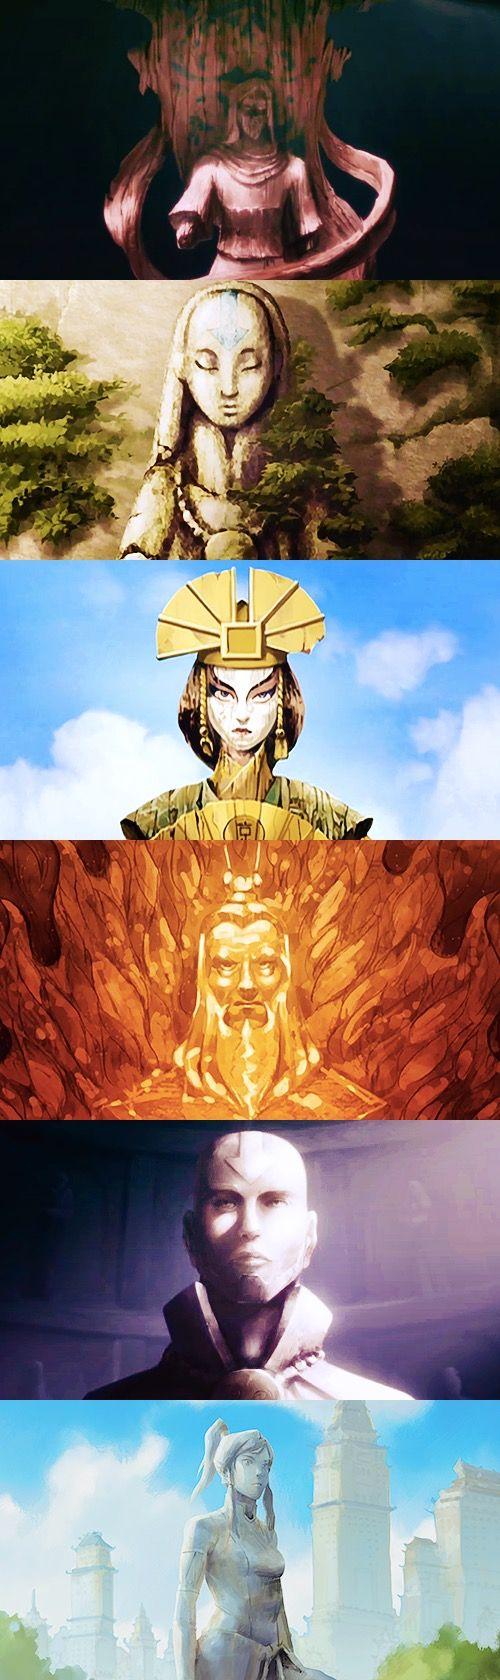 Los Avatar conocidos, menos tú Kuruk; tú no hiciste nada.